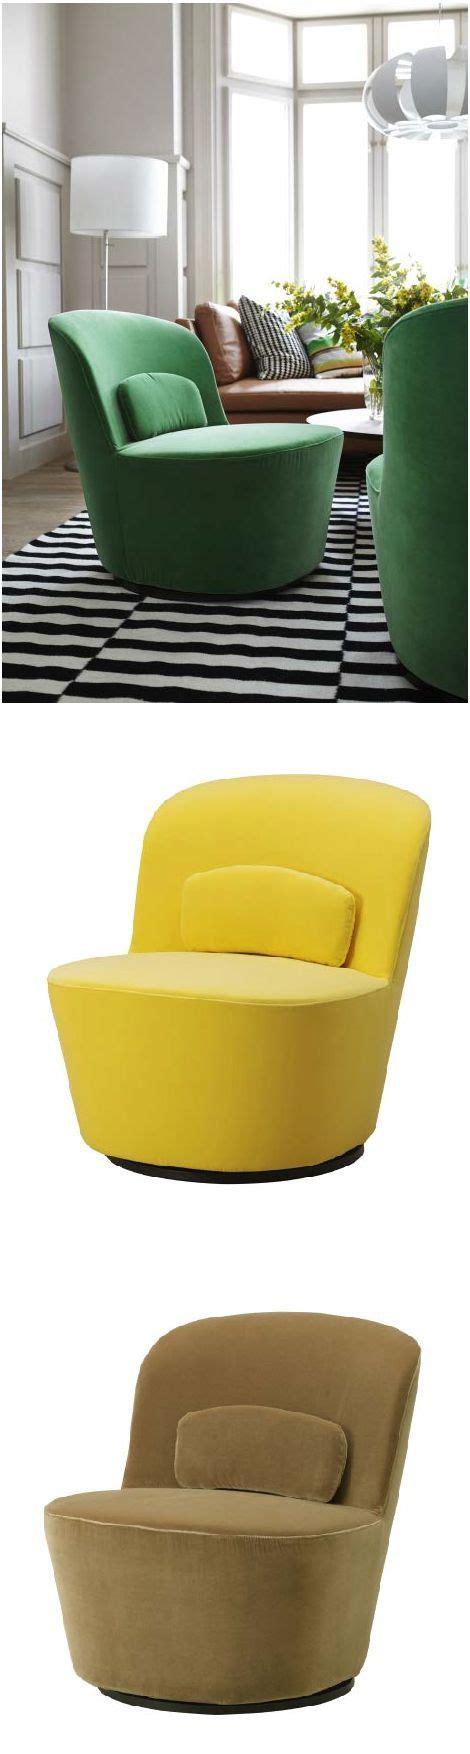 ikea stockholm armchair green stockholm swivel chair sandbacka green receptions